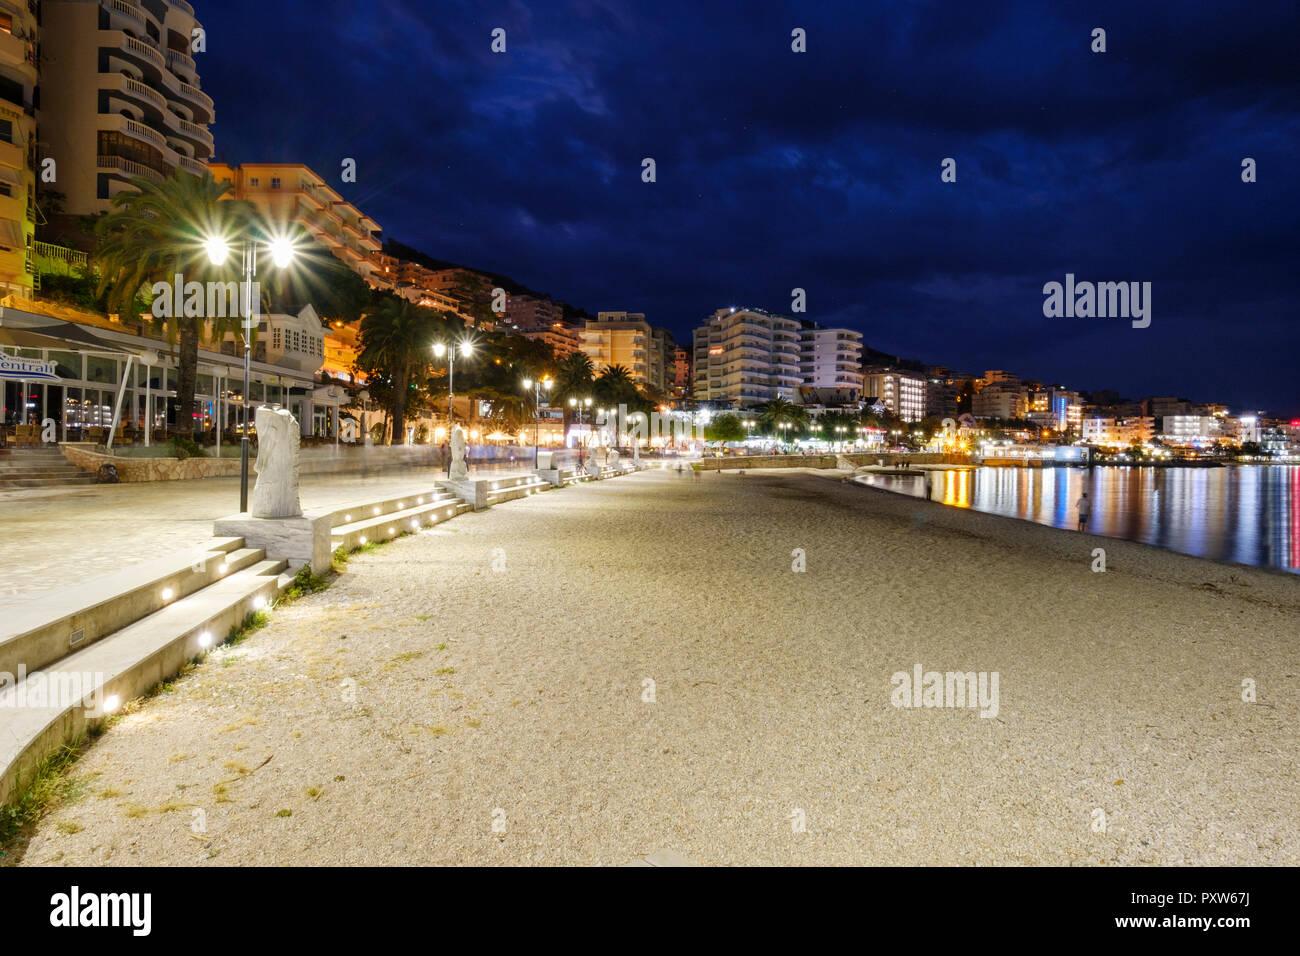 Albania, Vlore County, Saranda, beach at blue hour - Stock Image